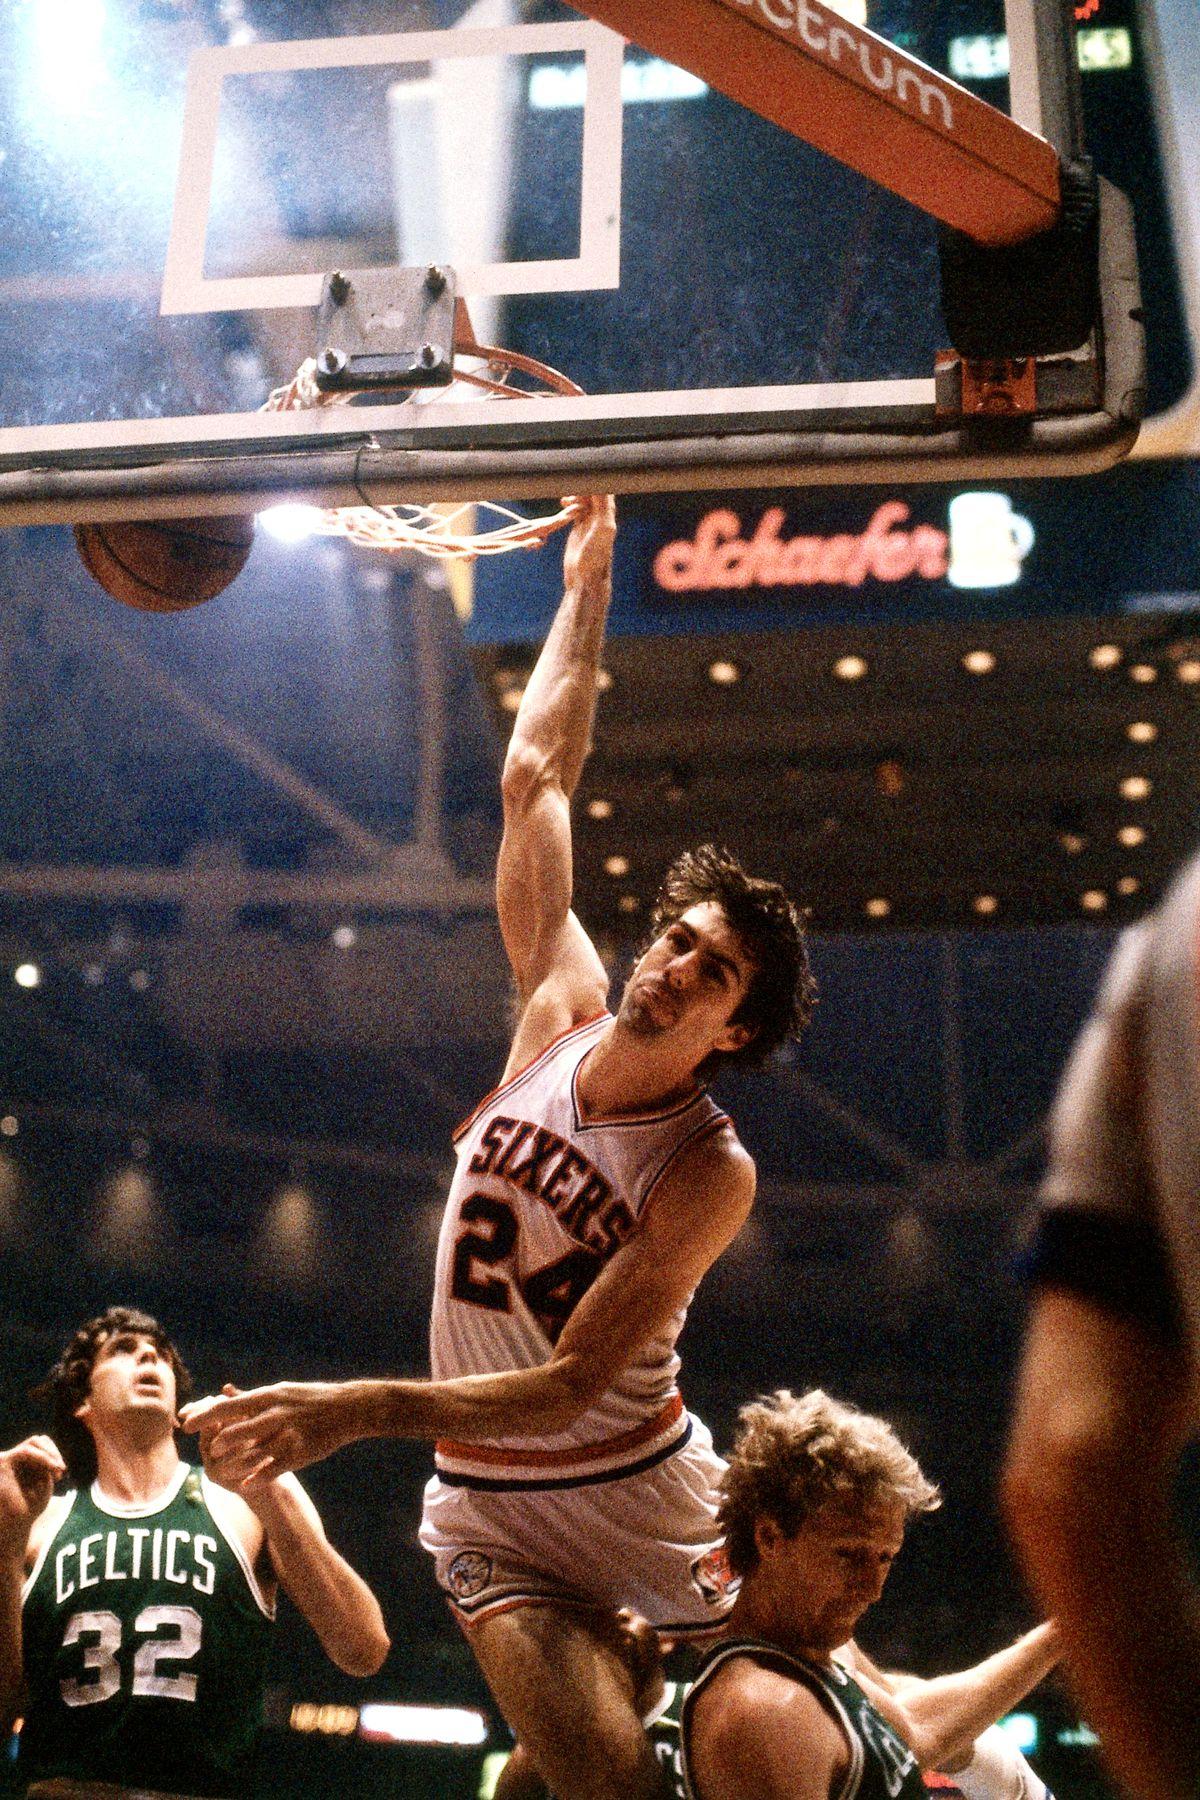 Bobby Jones dunk over Bird